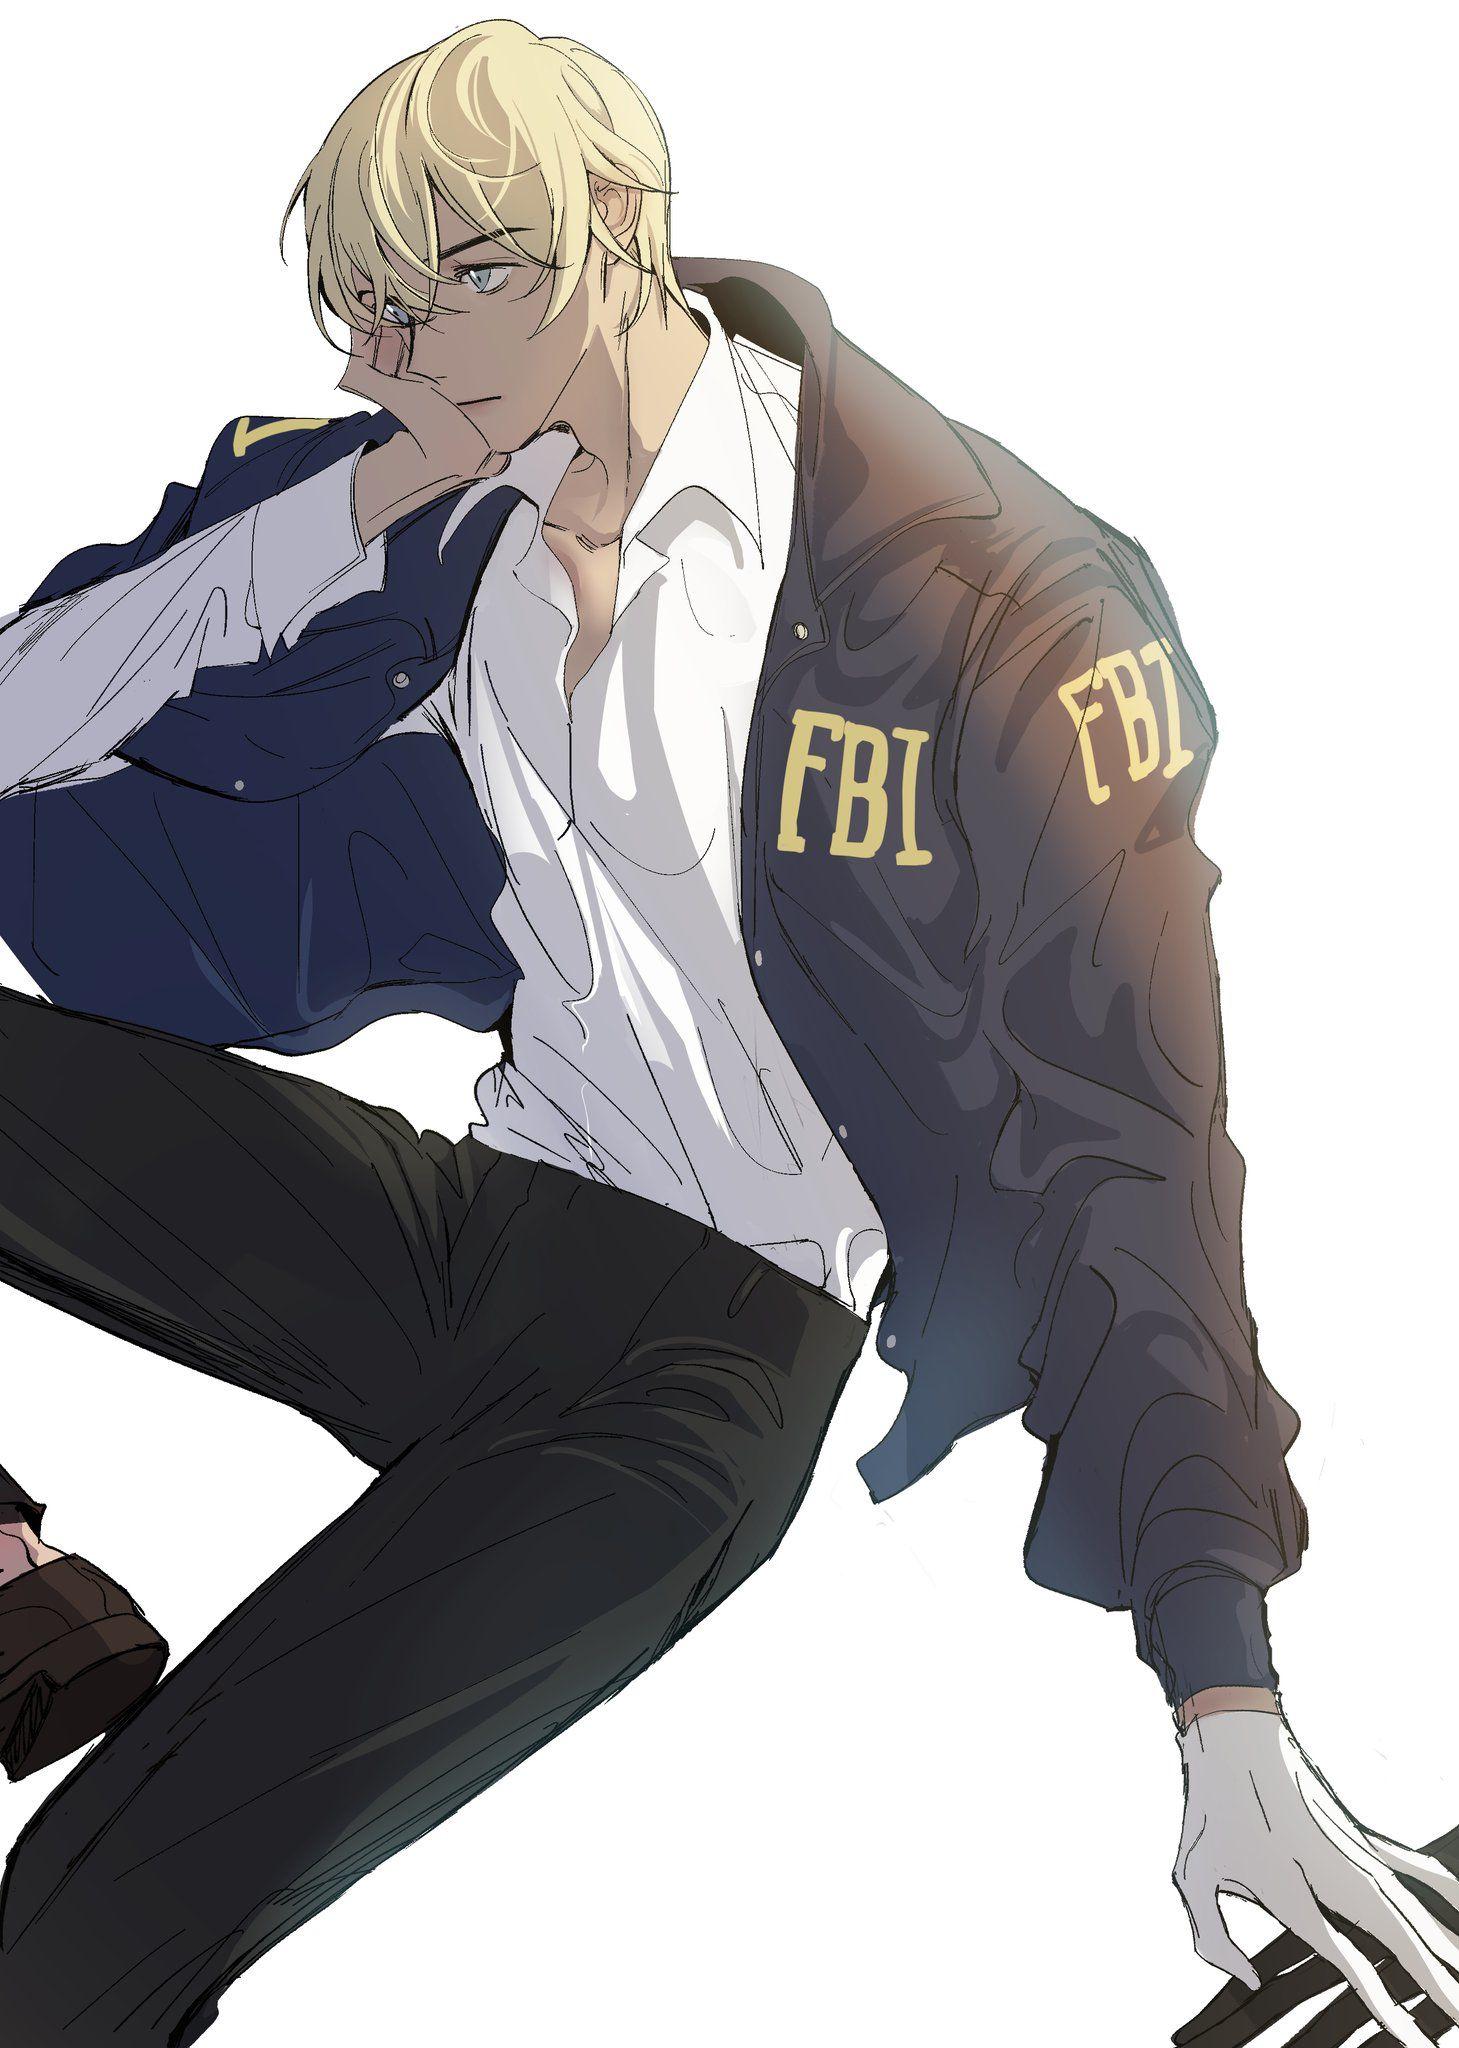 Pin by LovelySakura777 on Detective Conan Anime guys